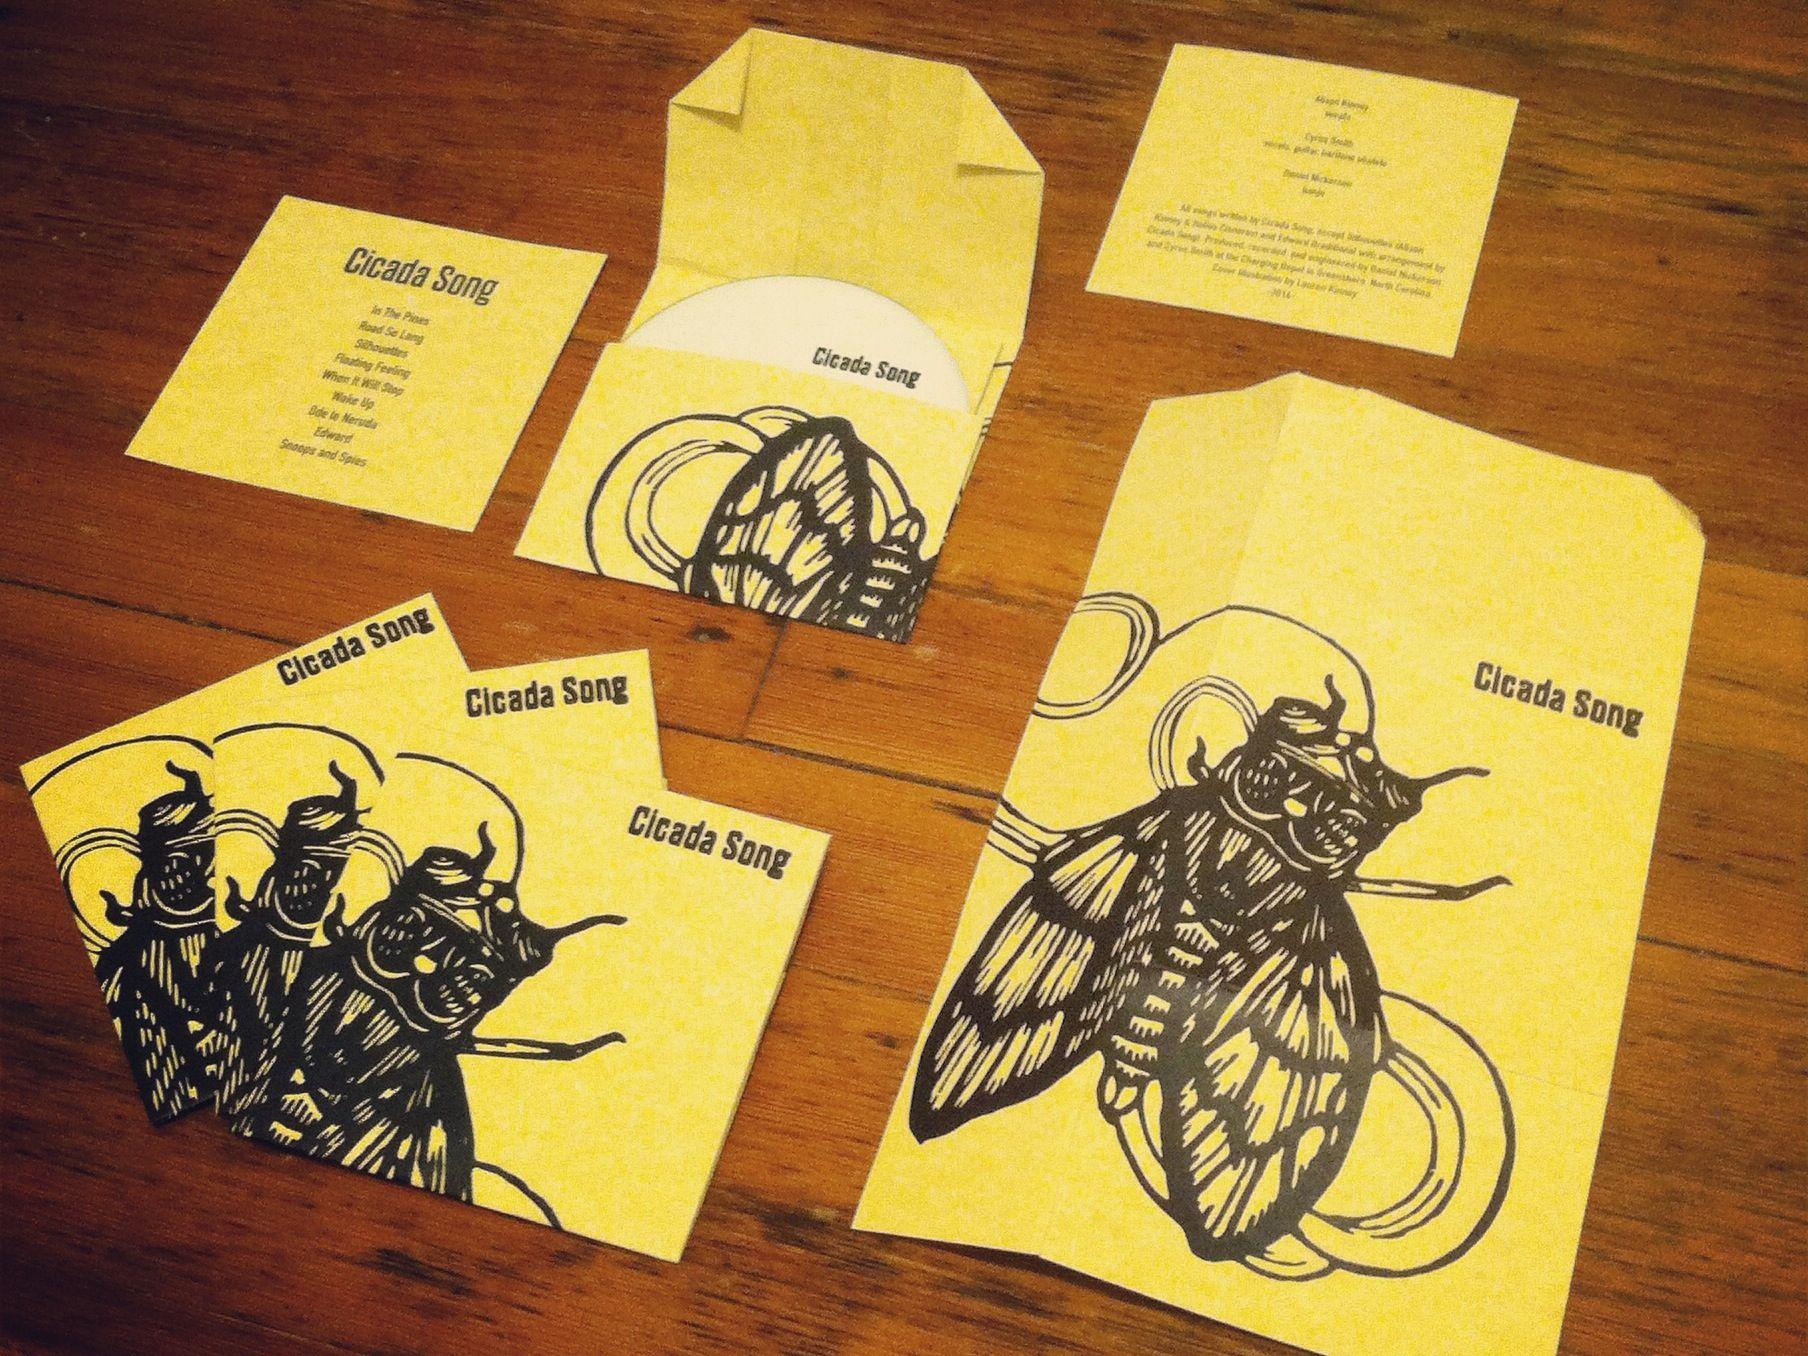 cicada song album website